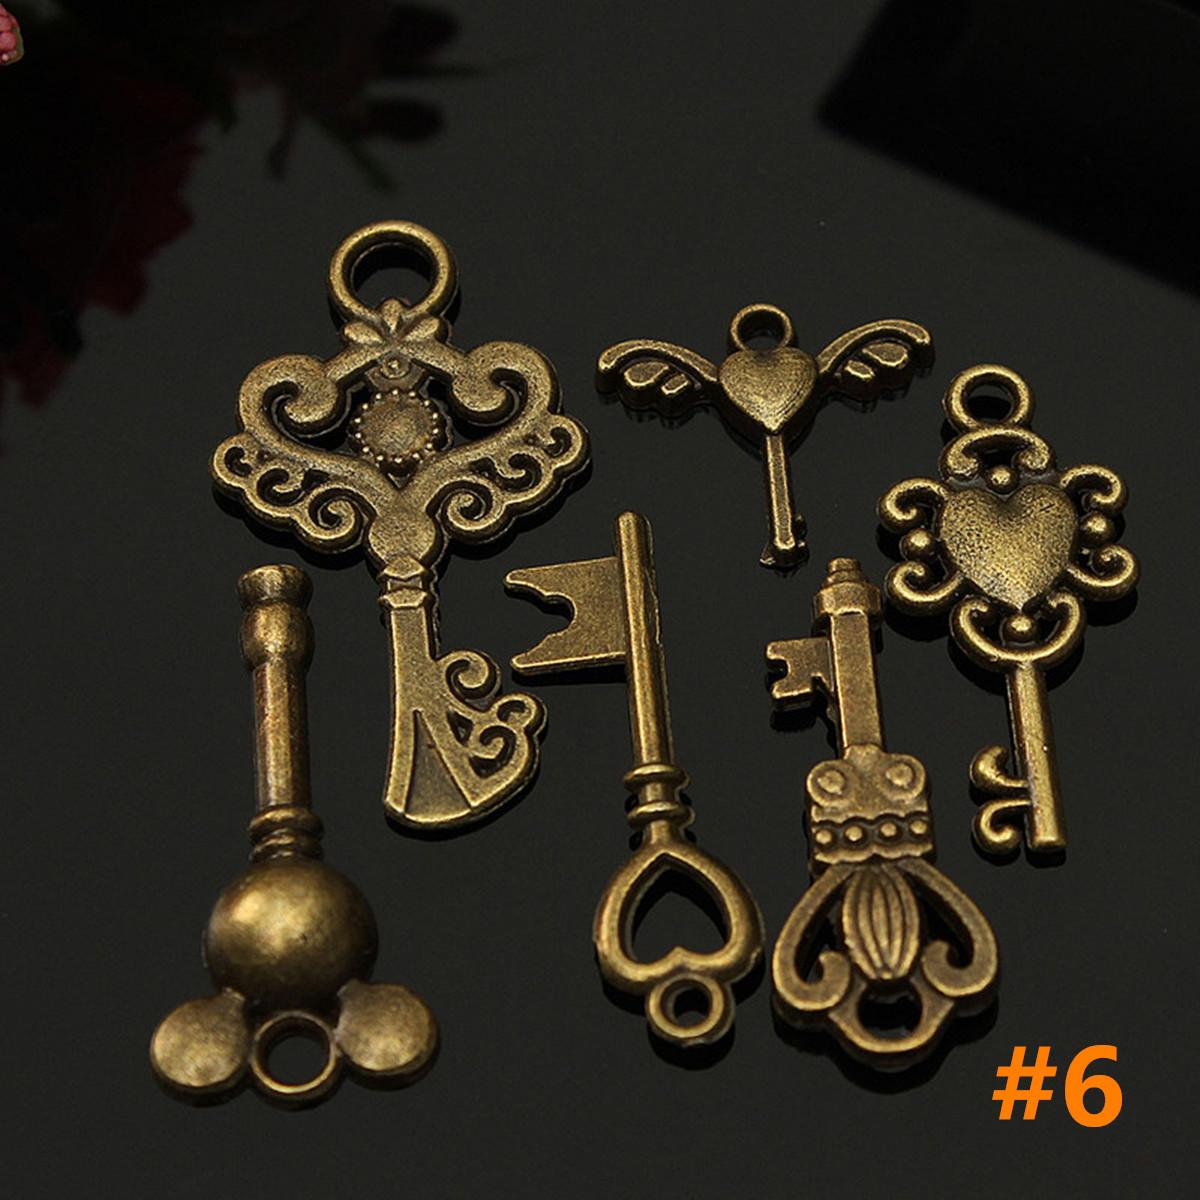 vintage style key set - photo #21